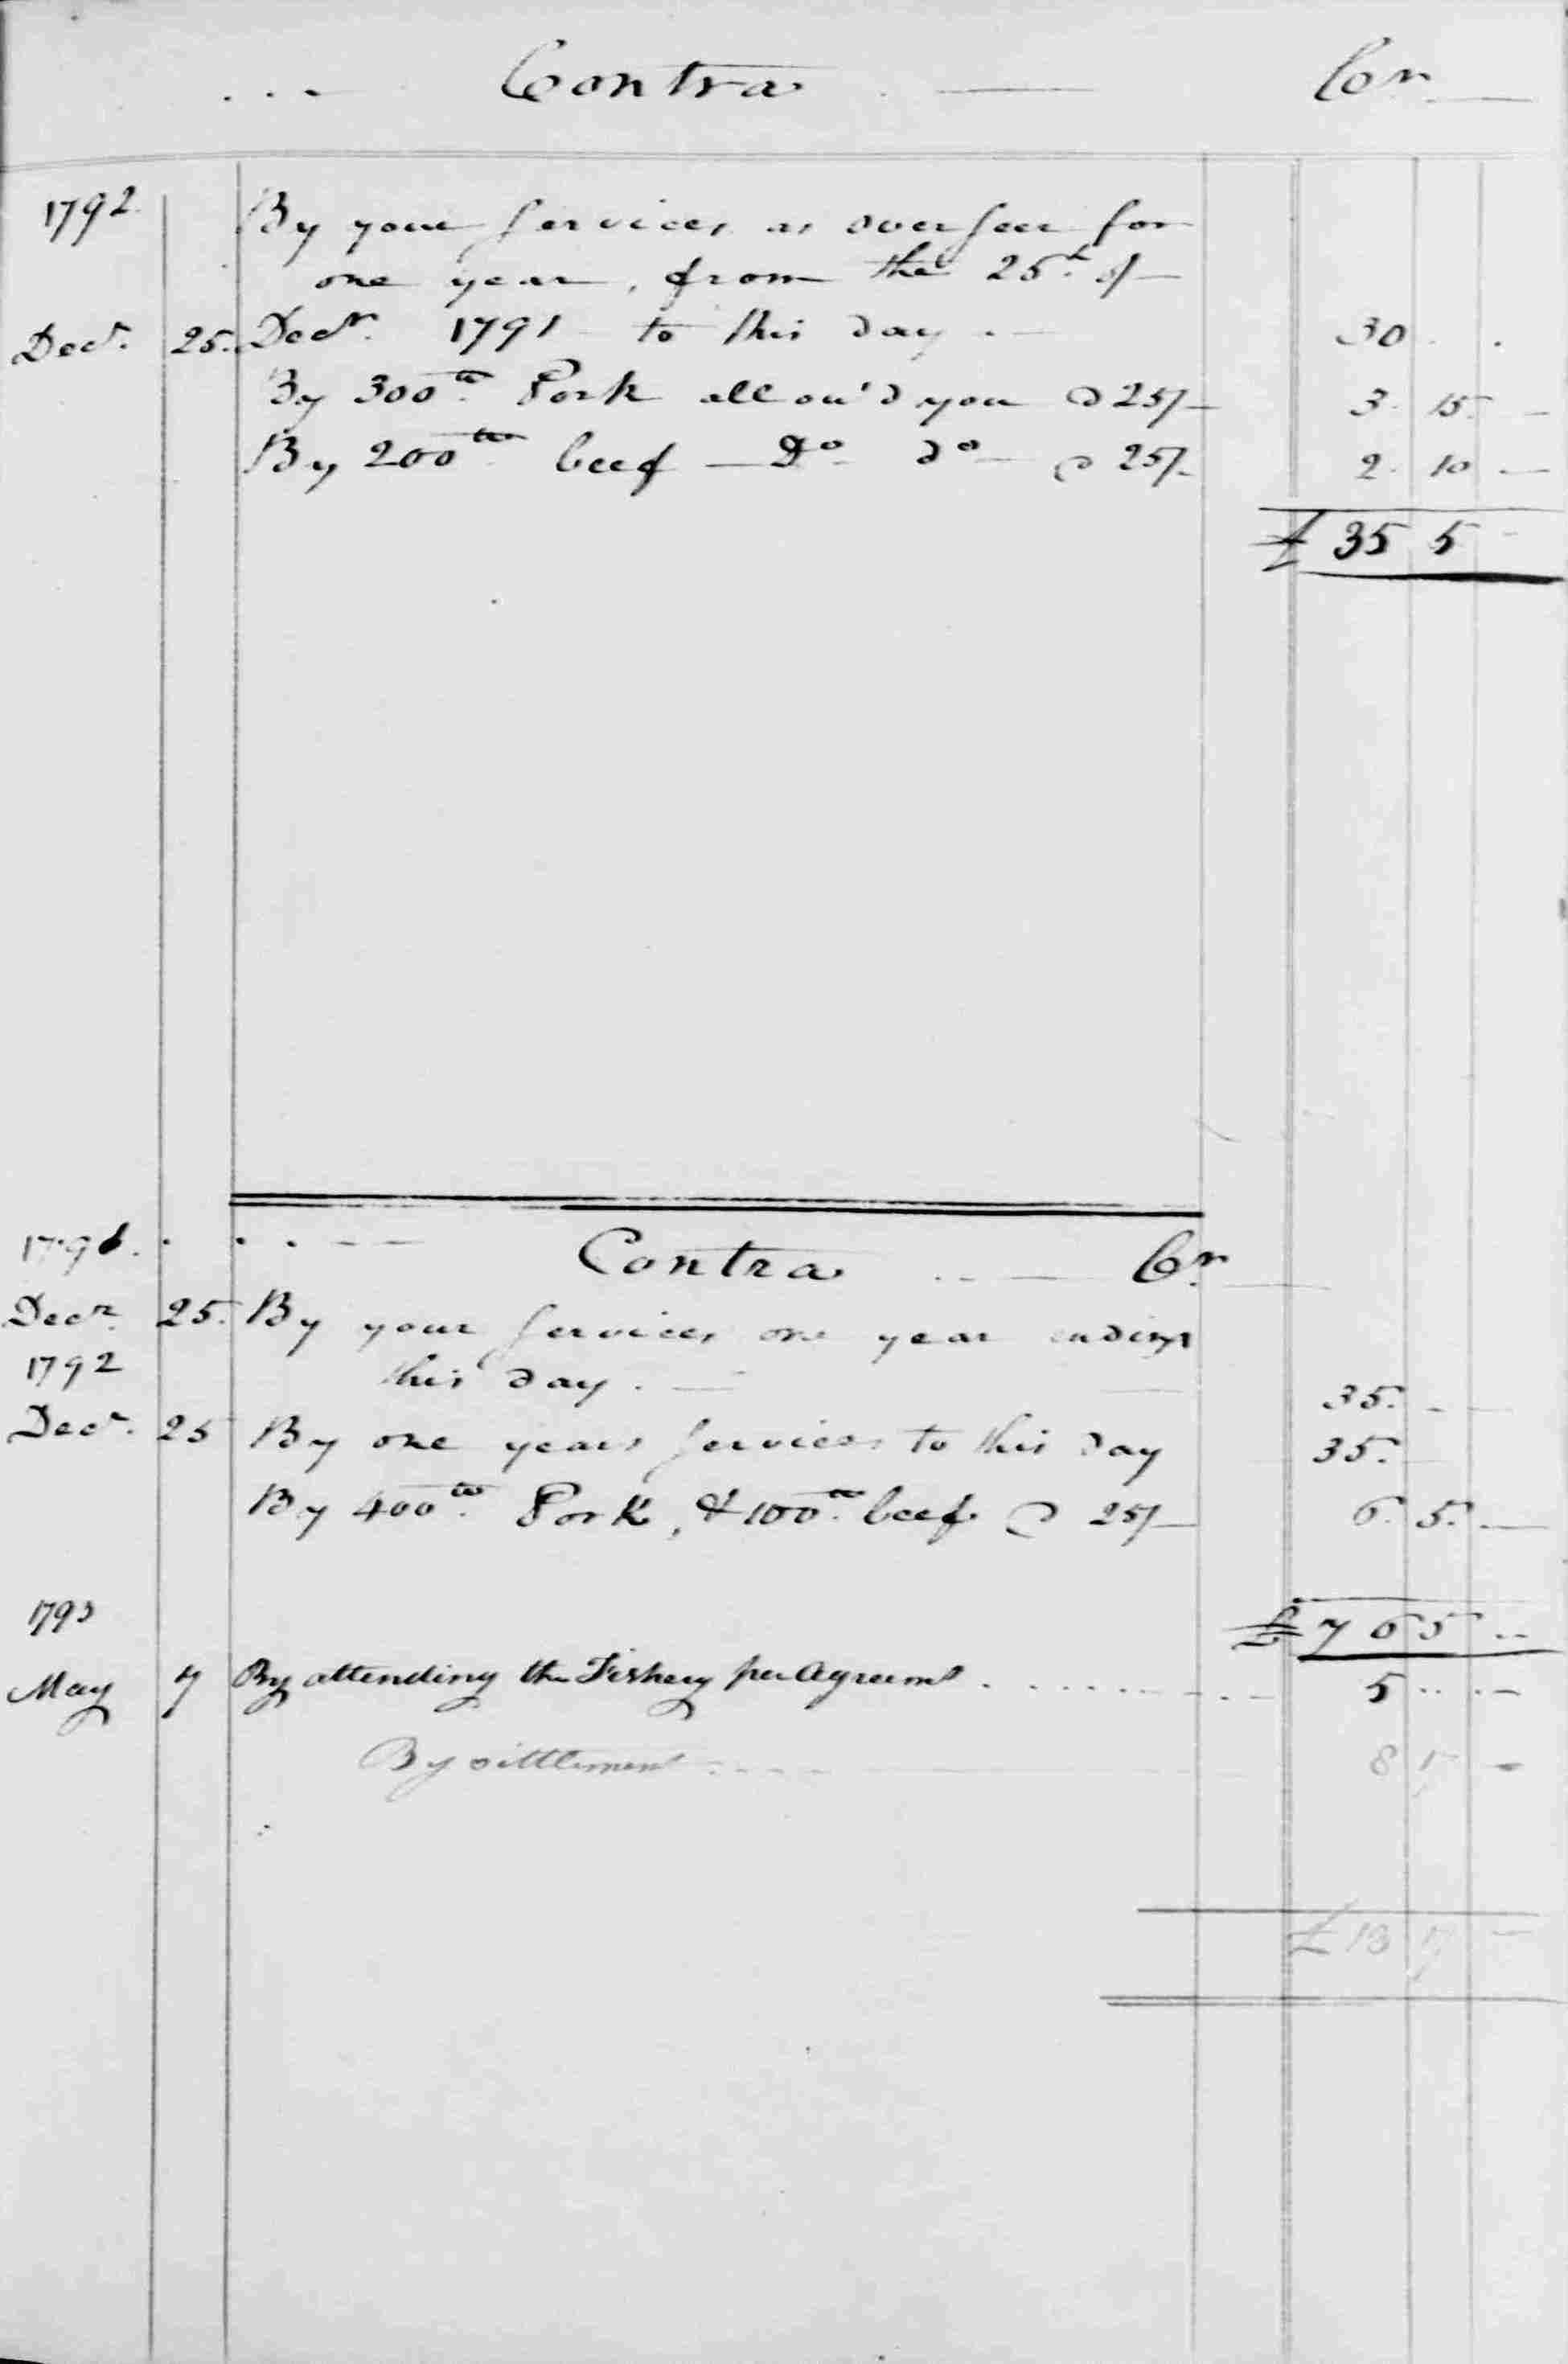 Ledger B, folio 351, right side